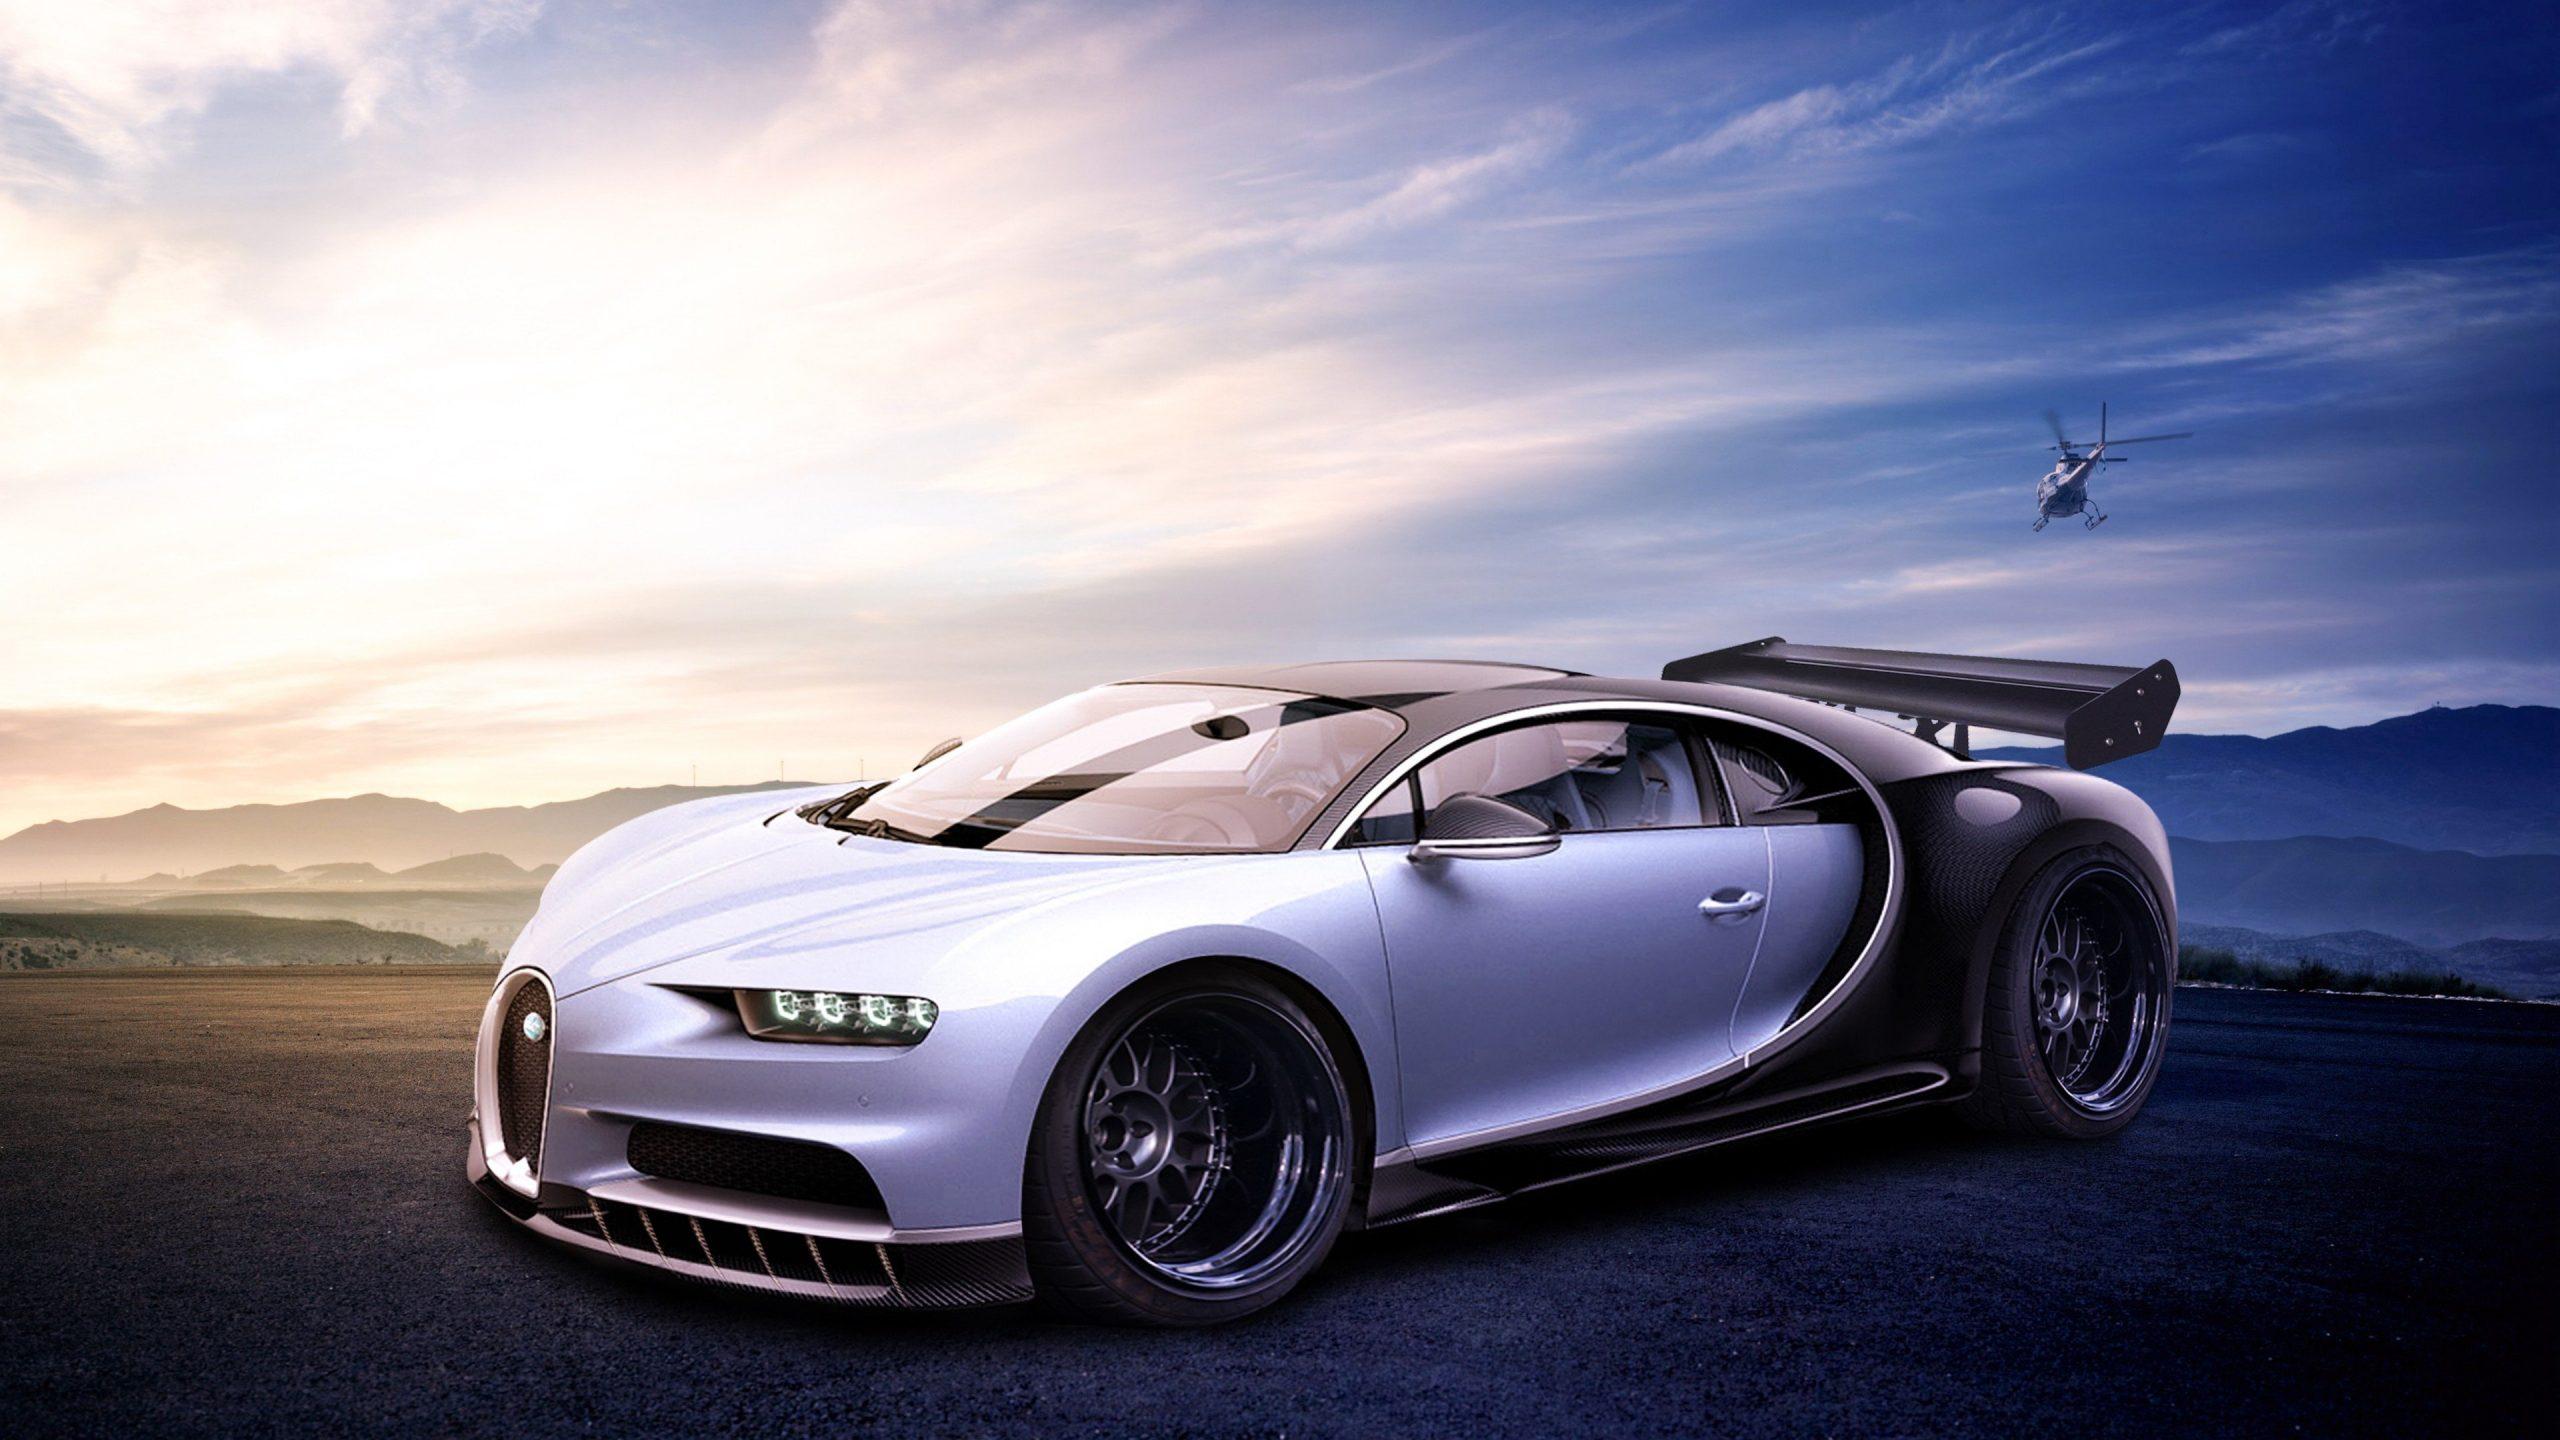 Bugatti free download wallpaper